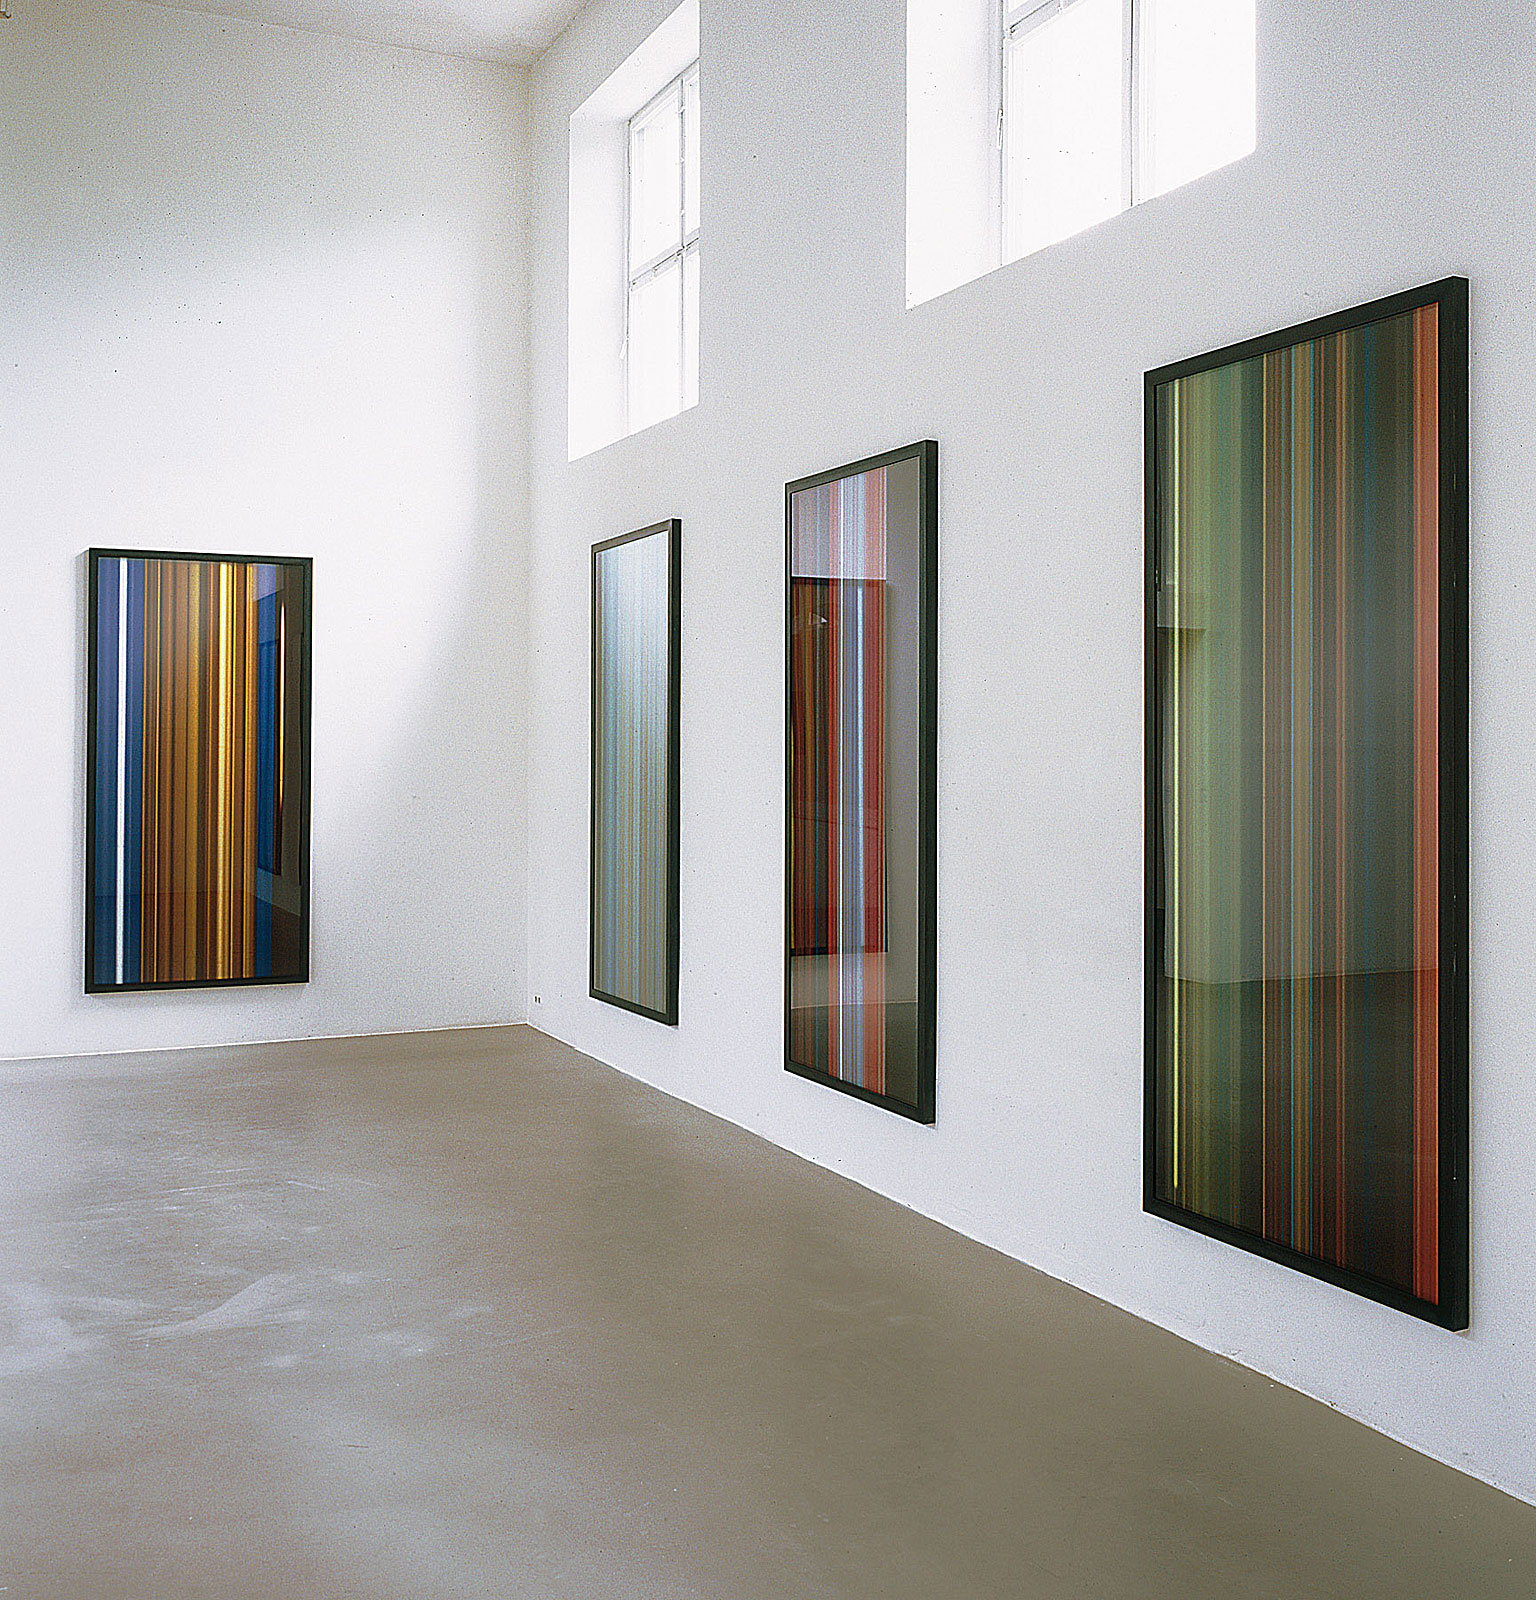 Dead ƒ Pan, Kunstverein München